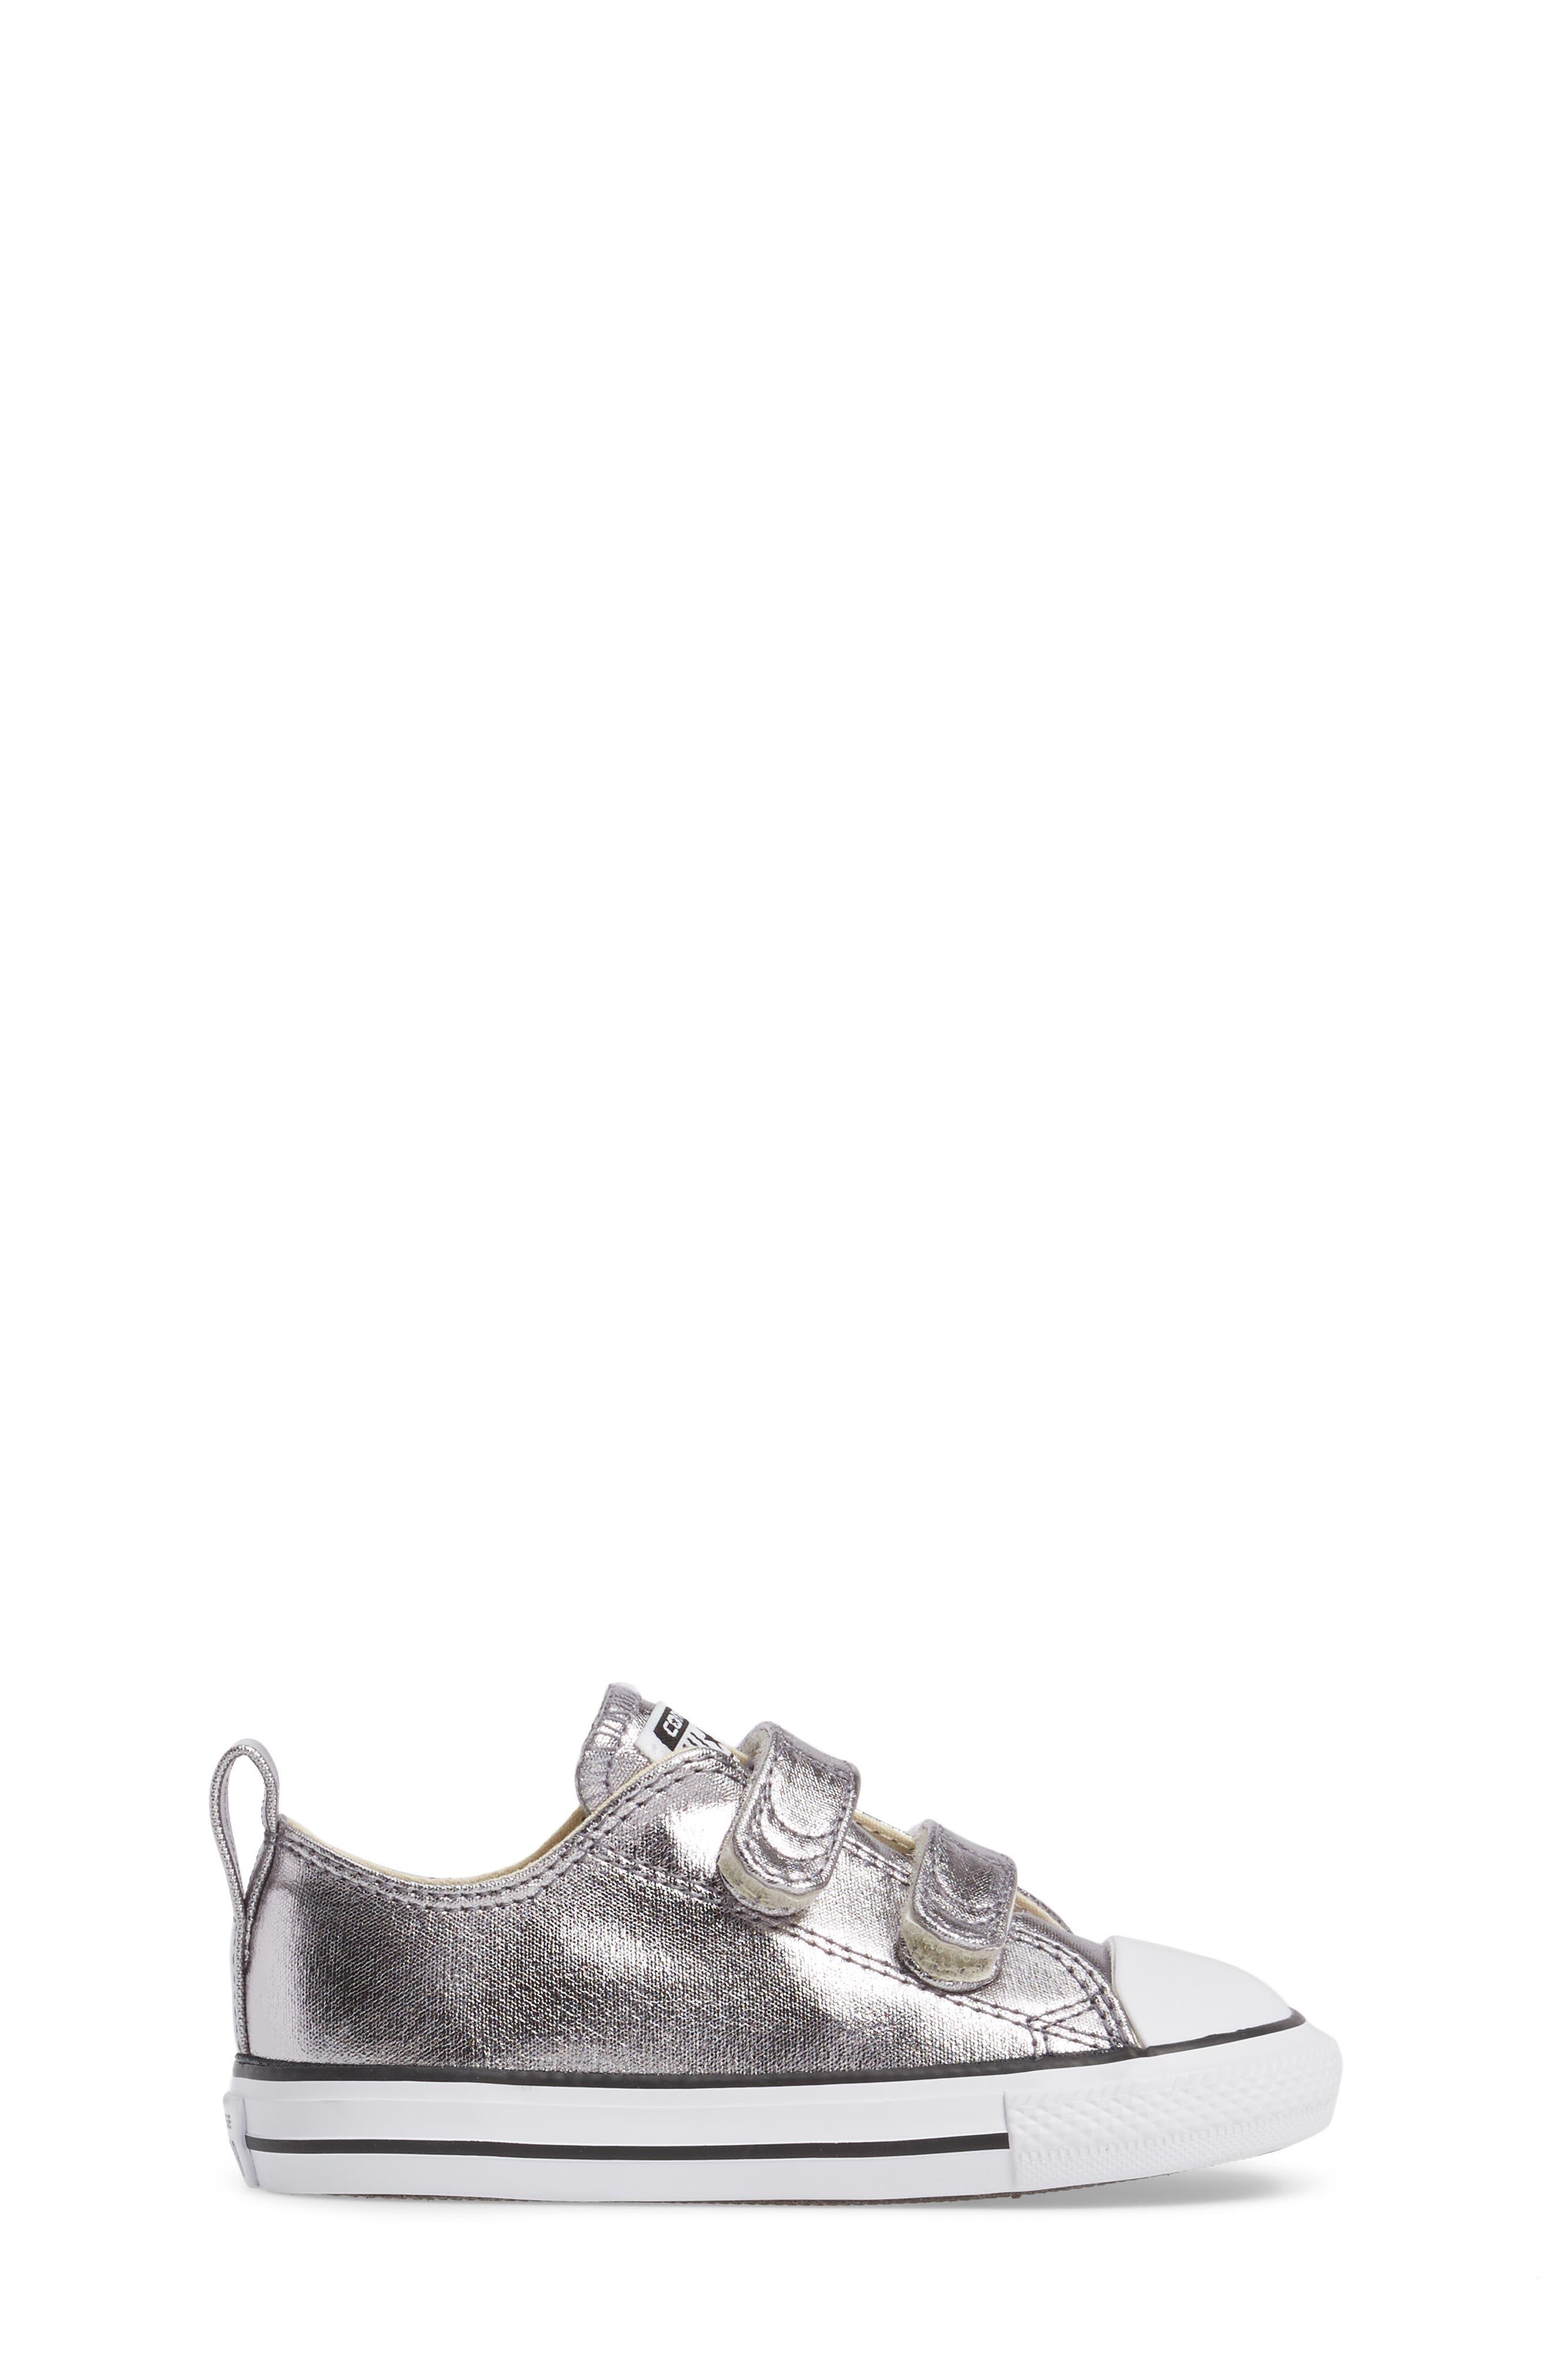 Chuck Taylor<sup>®</sup> All Star<sup>®</sup> Seasonal Metallic Low Top Sneaker,                             Alternate thumbnail 3, color,                             040